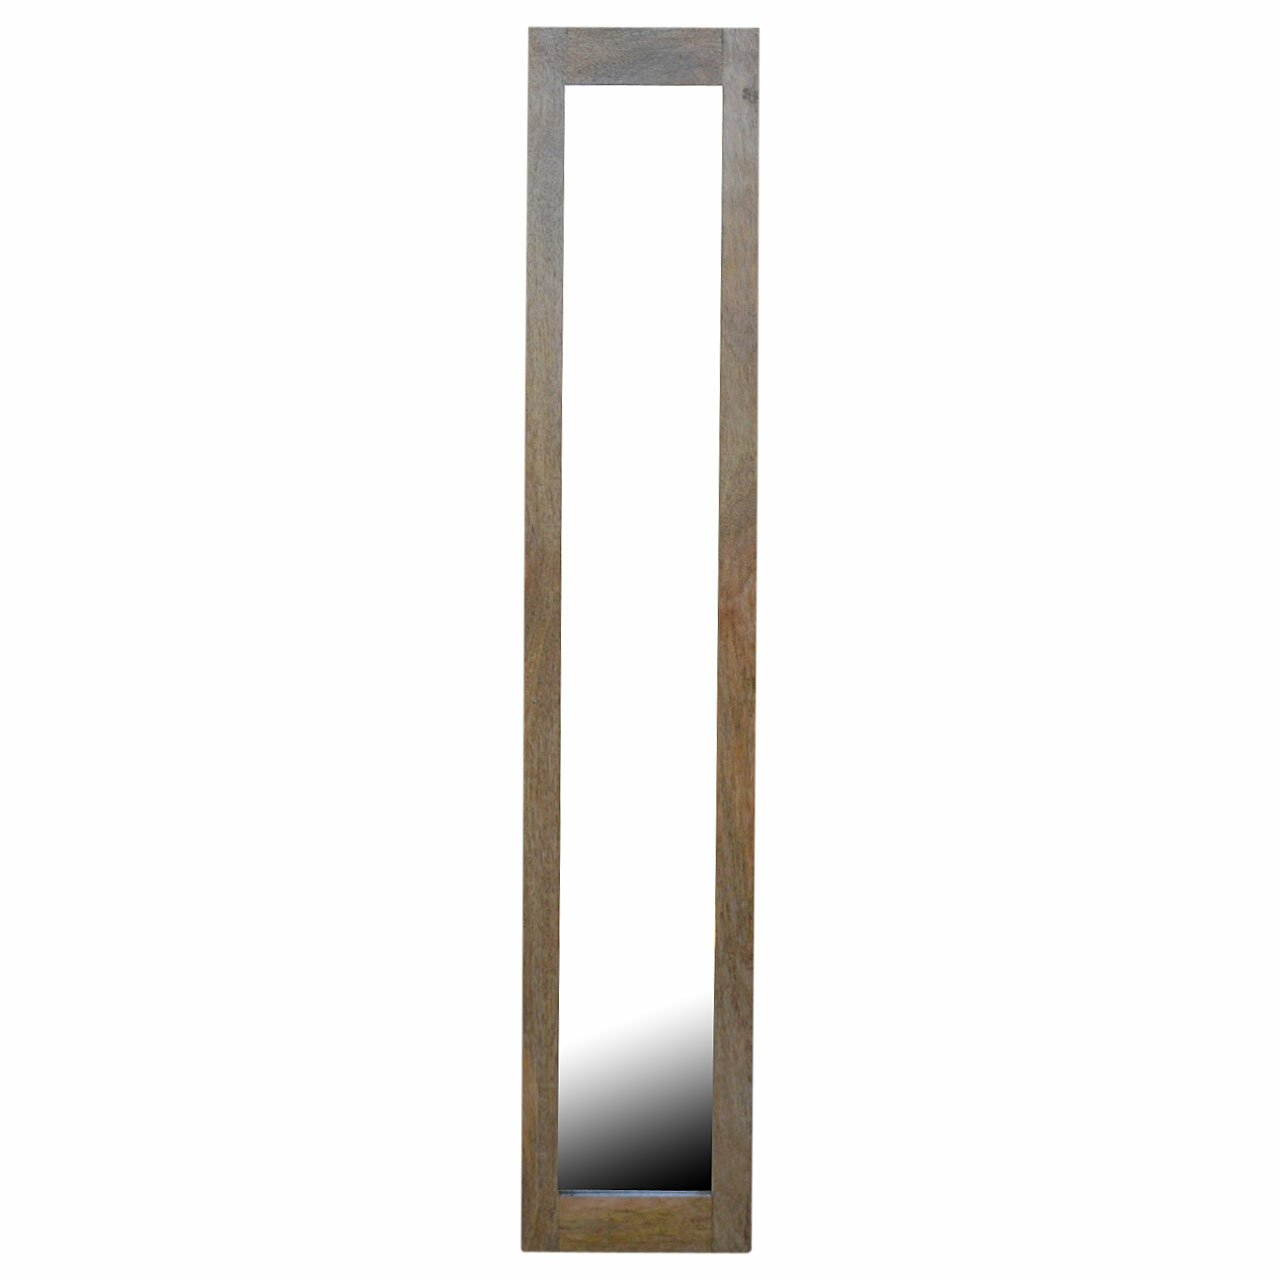 Dining Room Lights Idea Hazelwood Home Rectangular Framed Wall Mirror Wayfair Uk